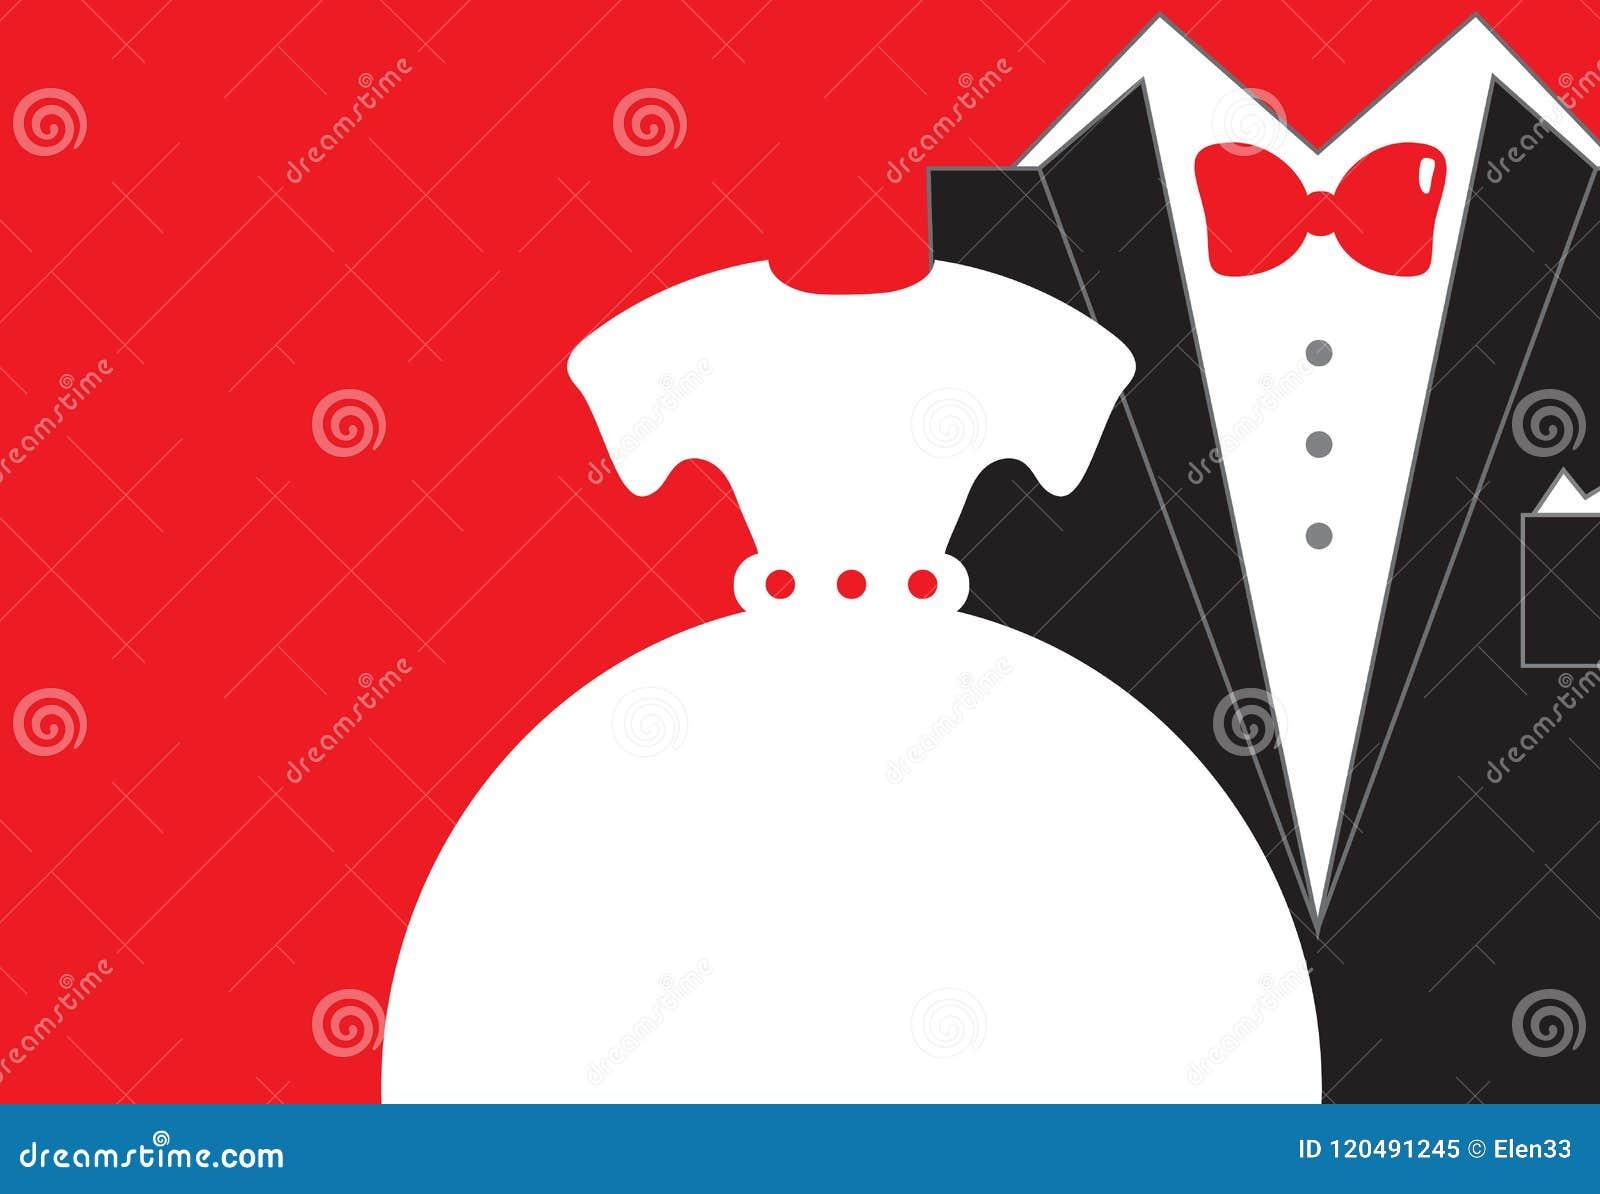 Bride And Groom Wedding Invitation Stock Vector - Illustration of ...